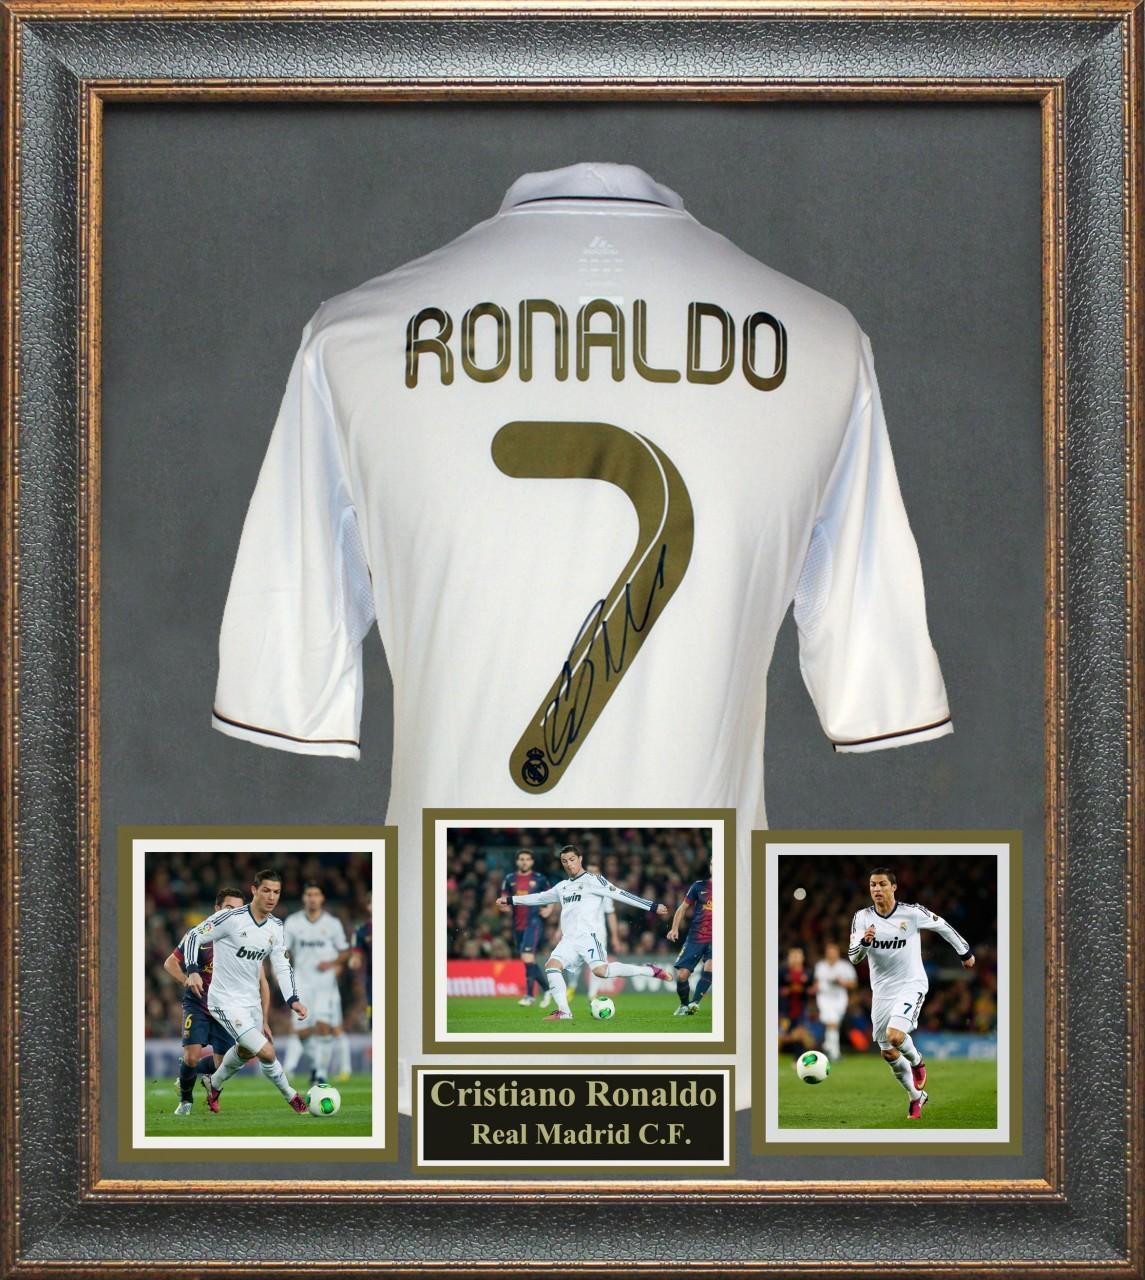 Photo credit: SportsMemorabilia.com: Cristiano Ronaldo, Real Madrid. Olé, Olé, Olé!